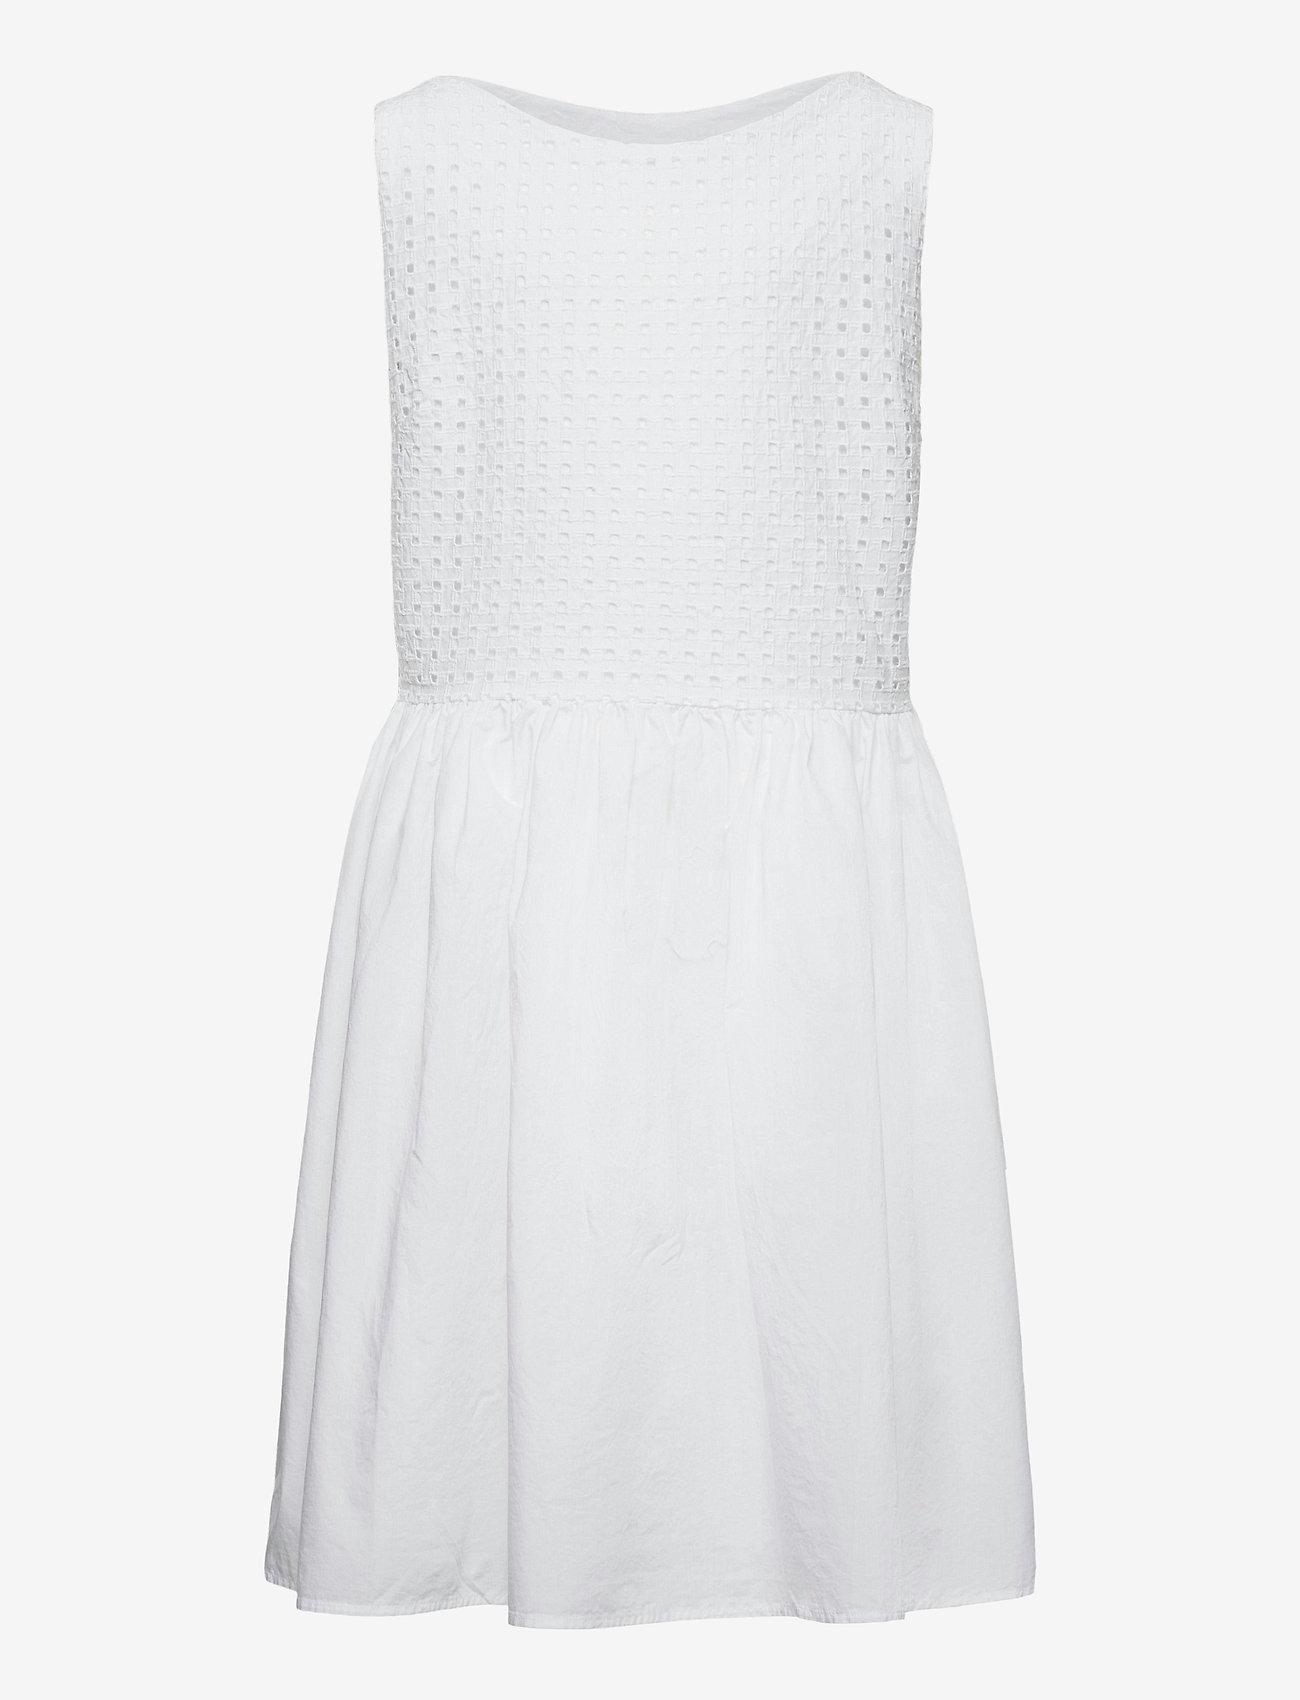 GANT - TG. BROIDERIE ANGLAISE DRESS - robes - white - 0